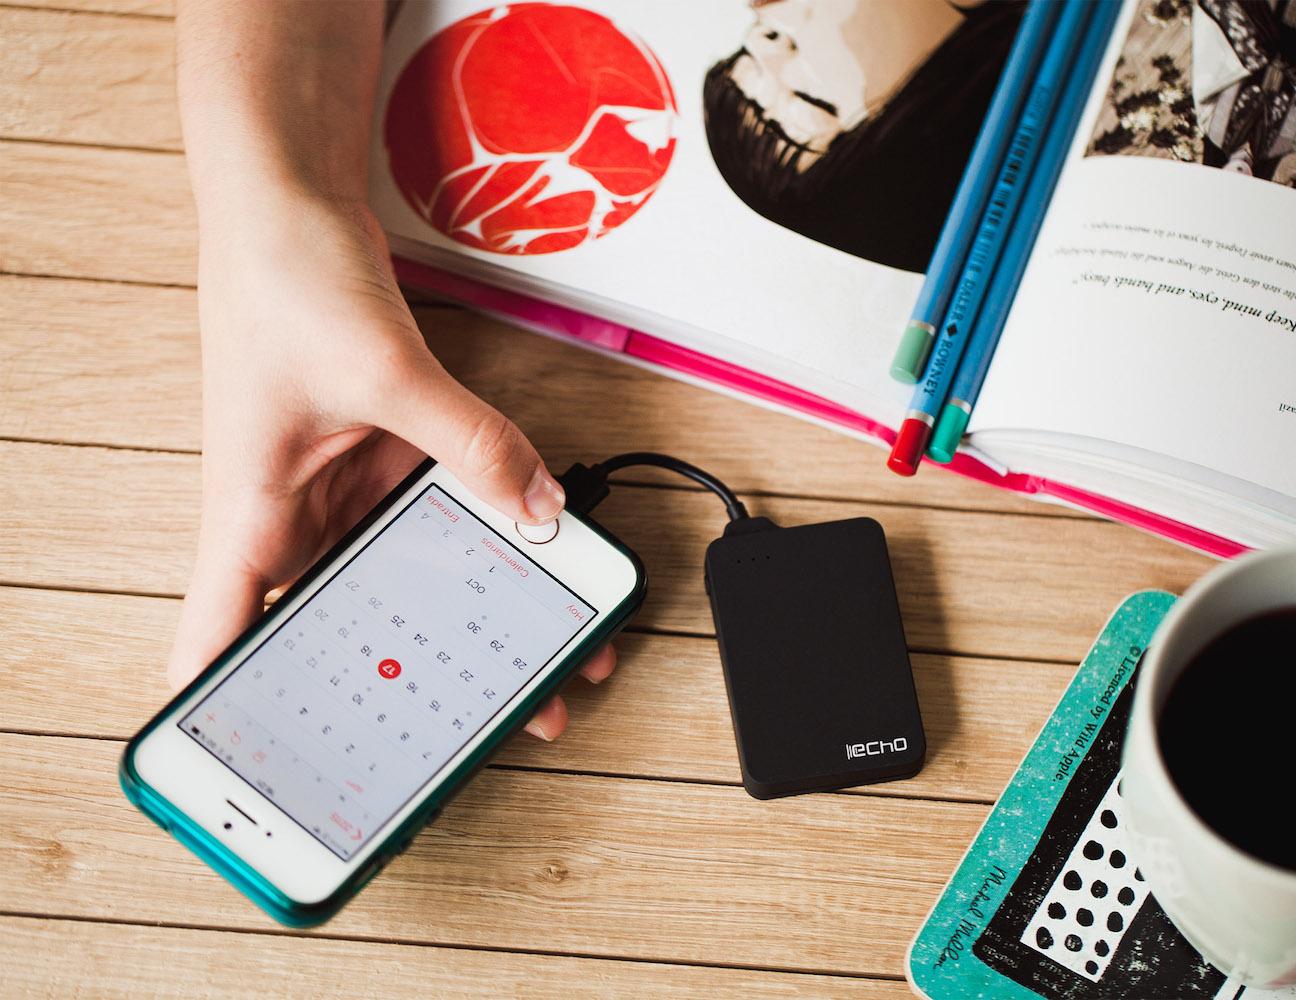 Echo PowerConnect Mini Portable Battery